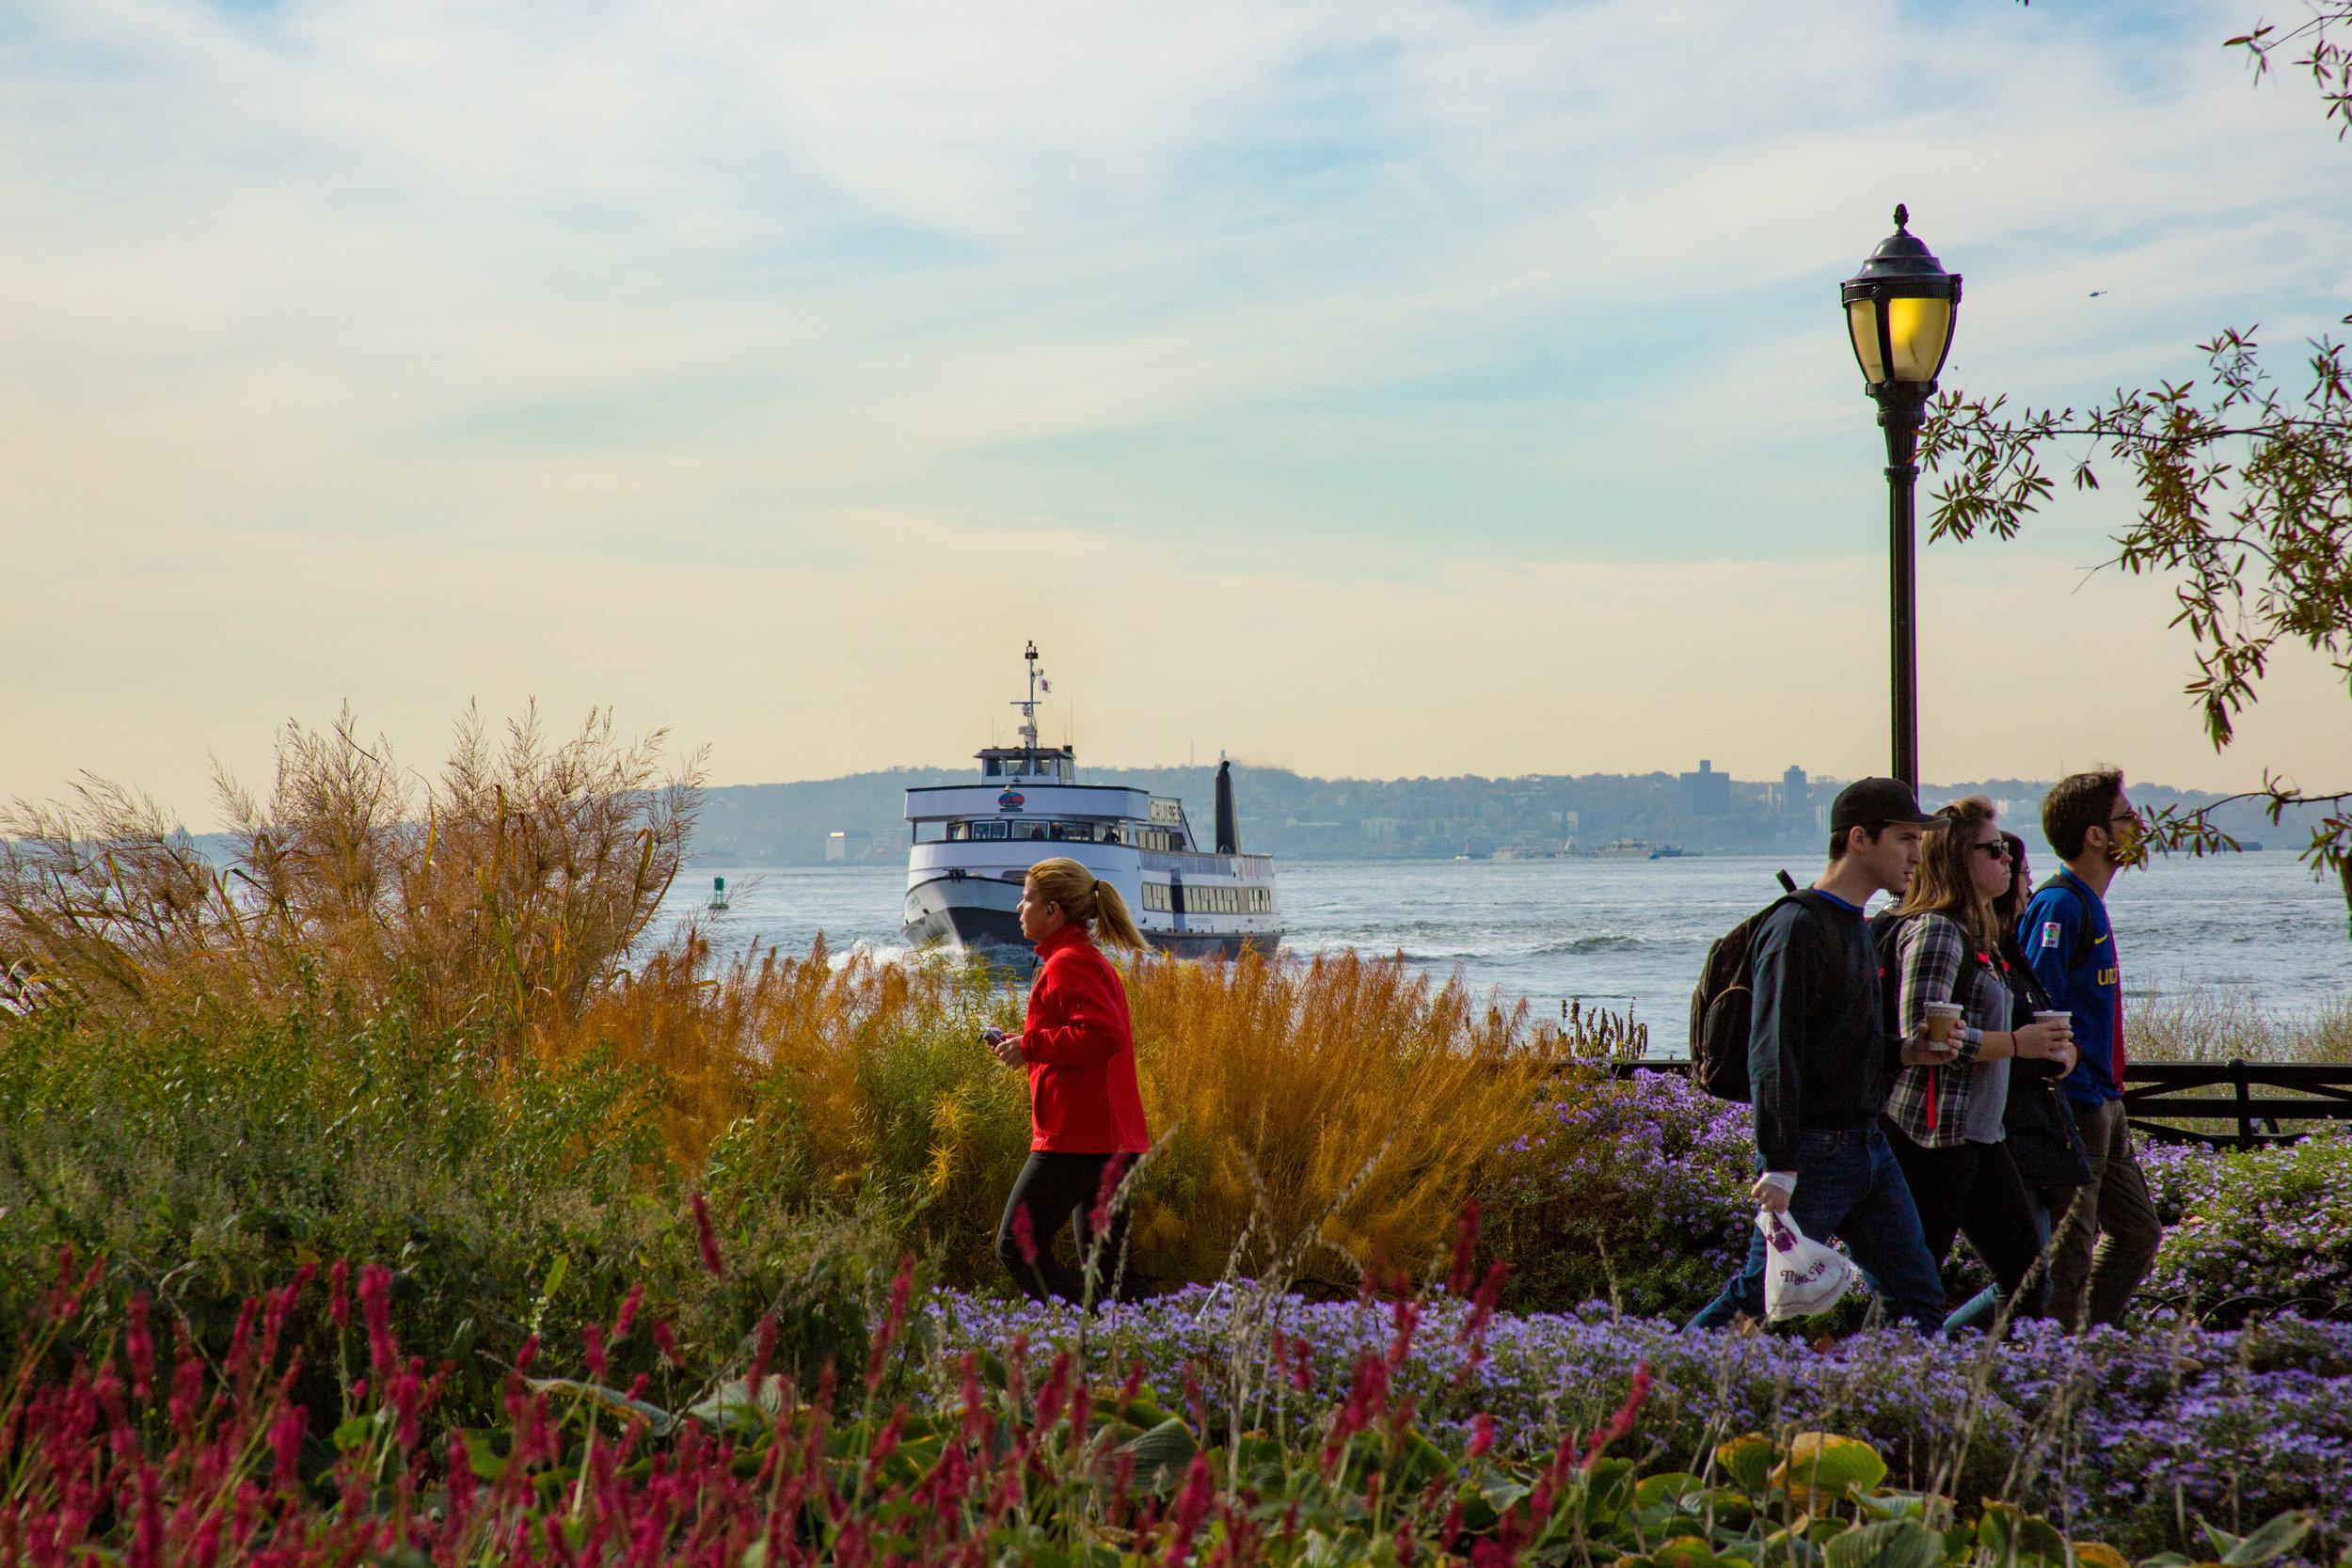 LSNY_Battery-Park-5.jpg